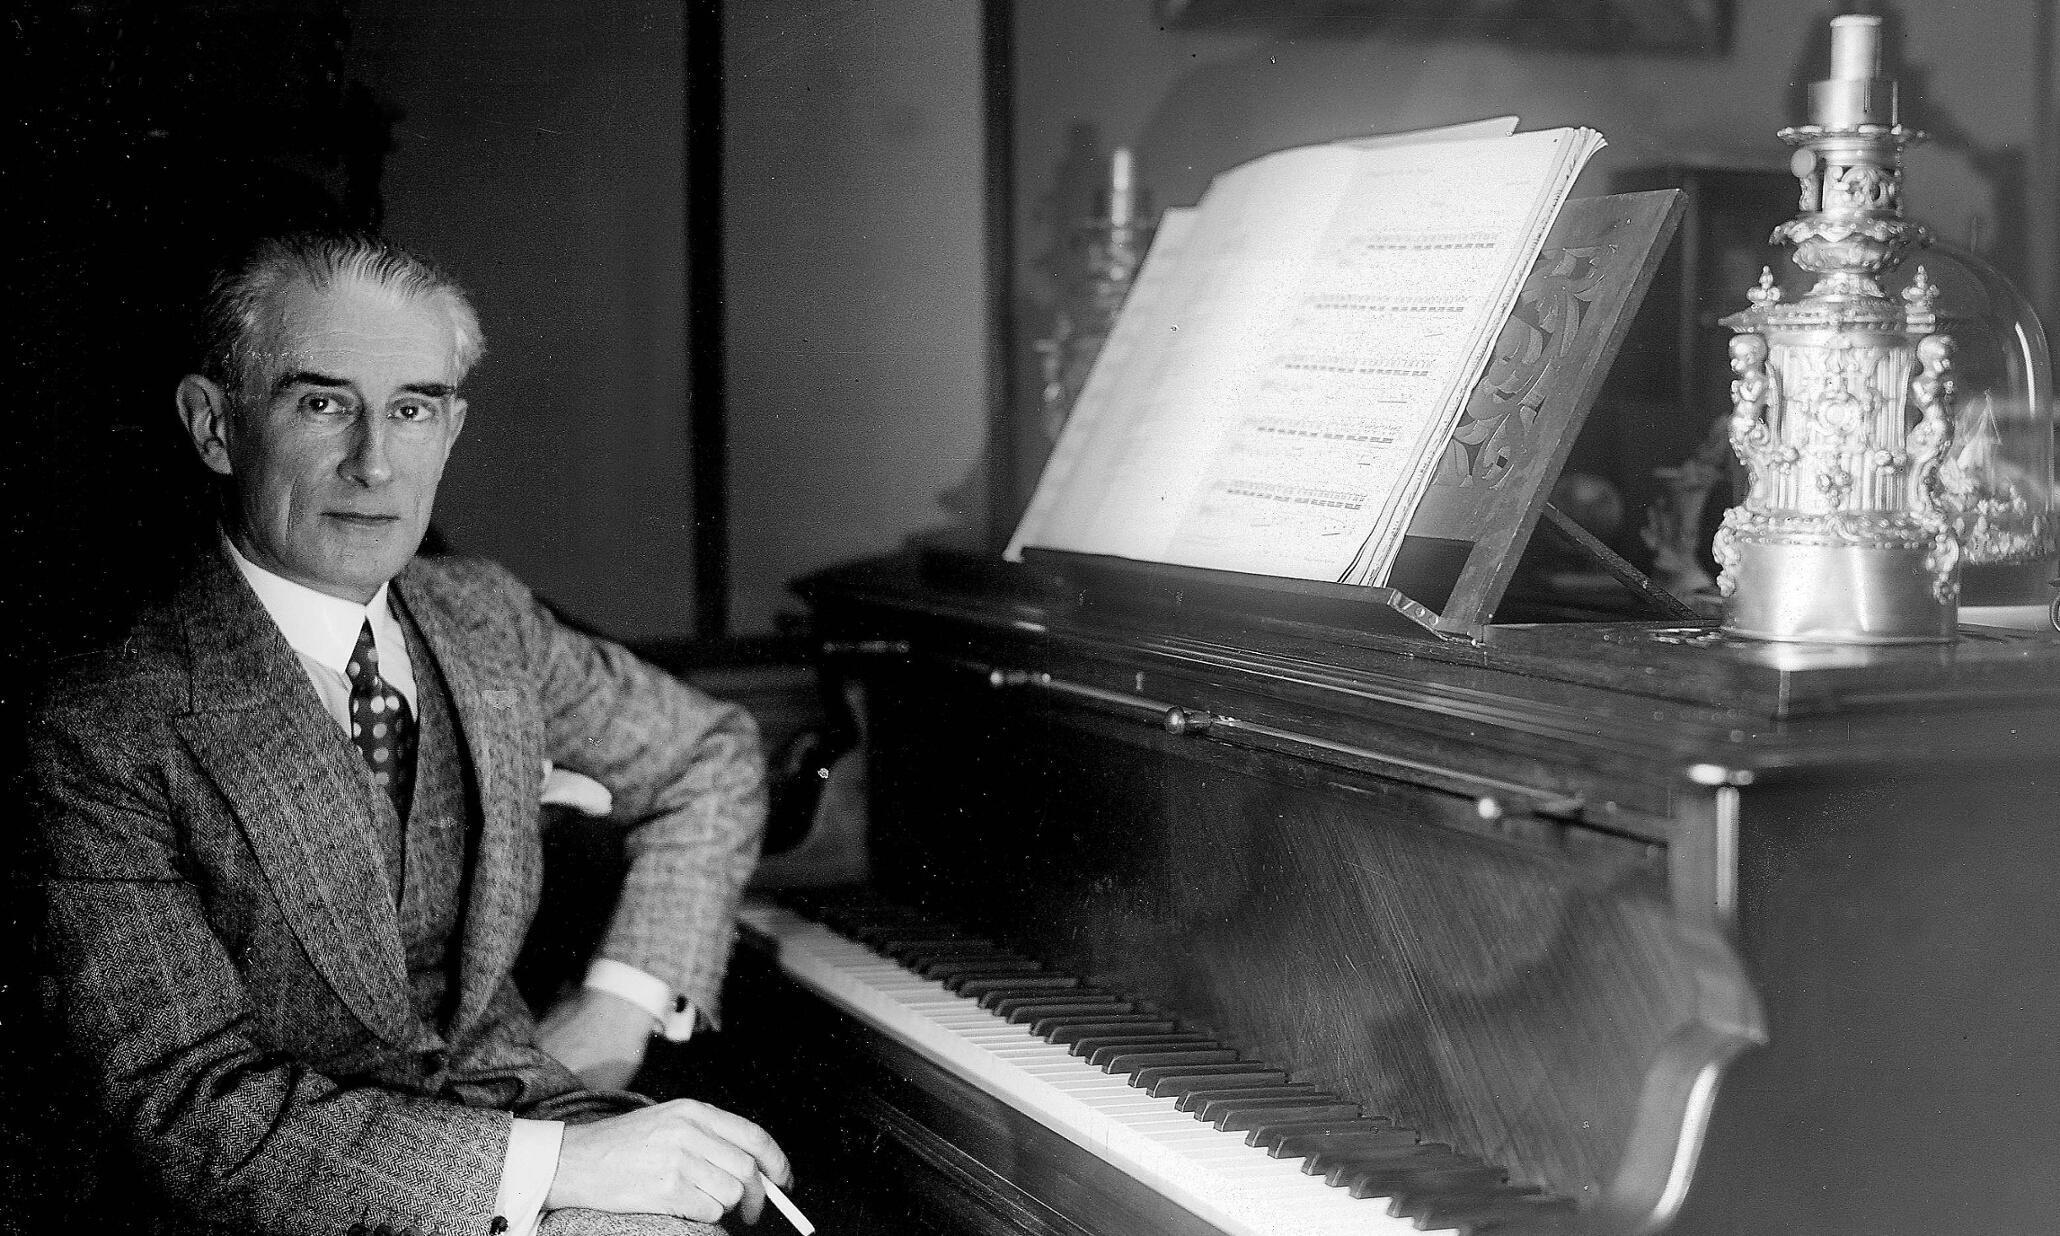 Nhạc sĩ Maurice Ravel (1875-1937)